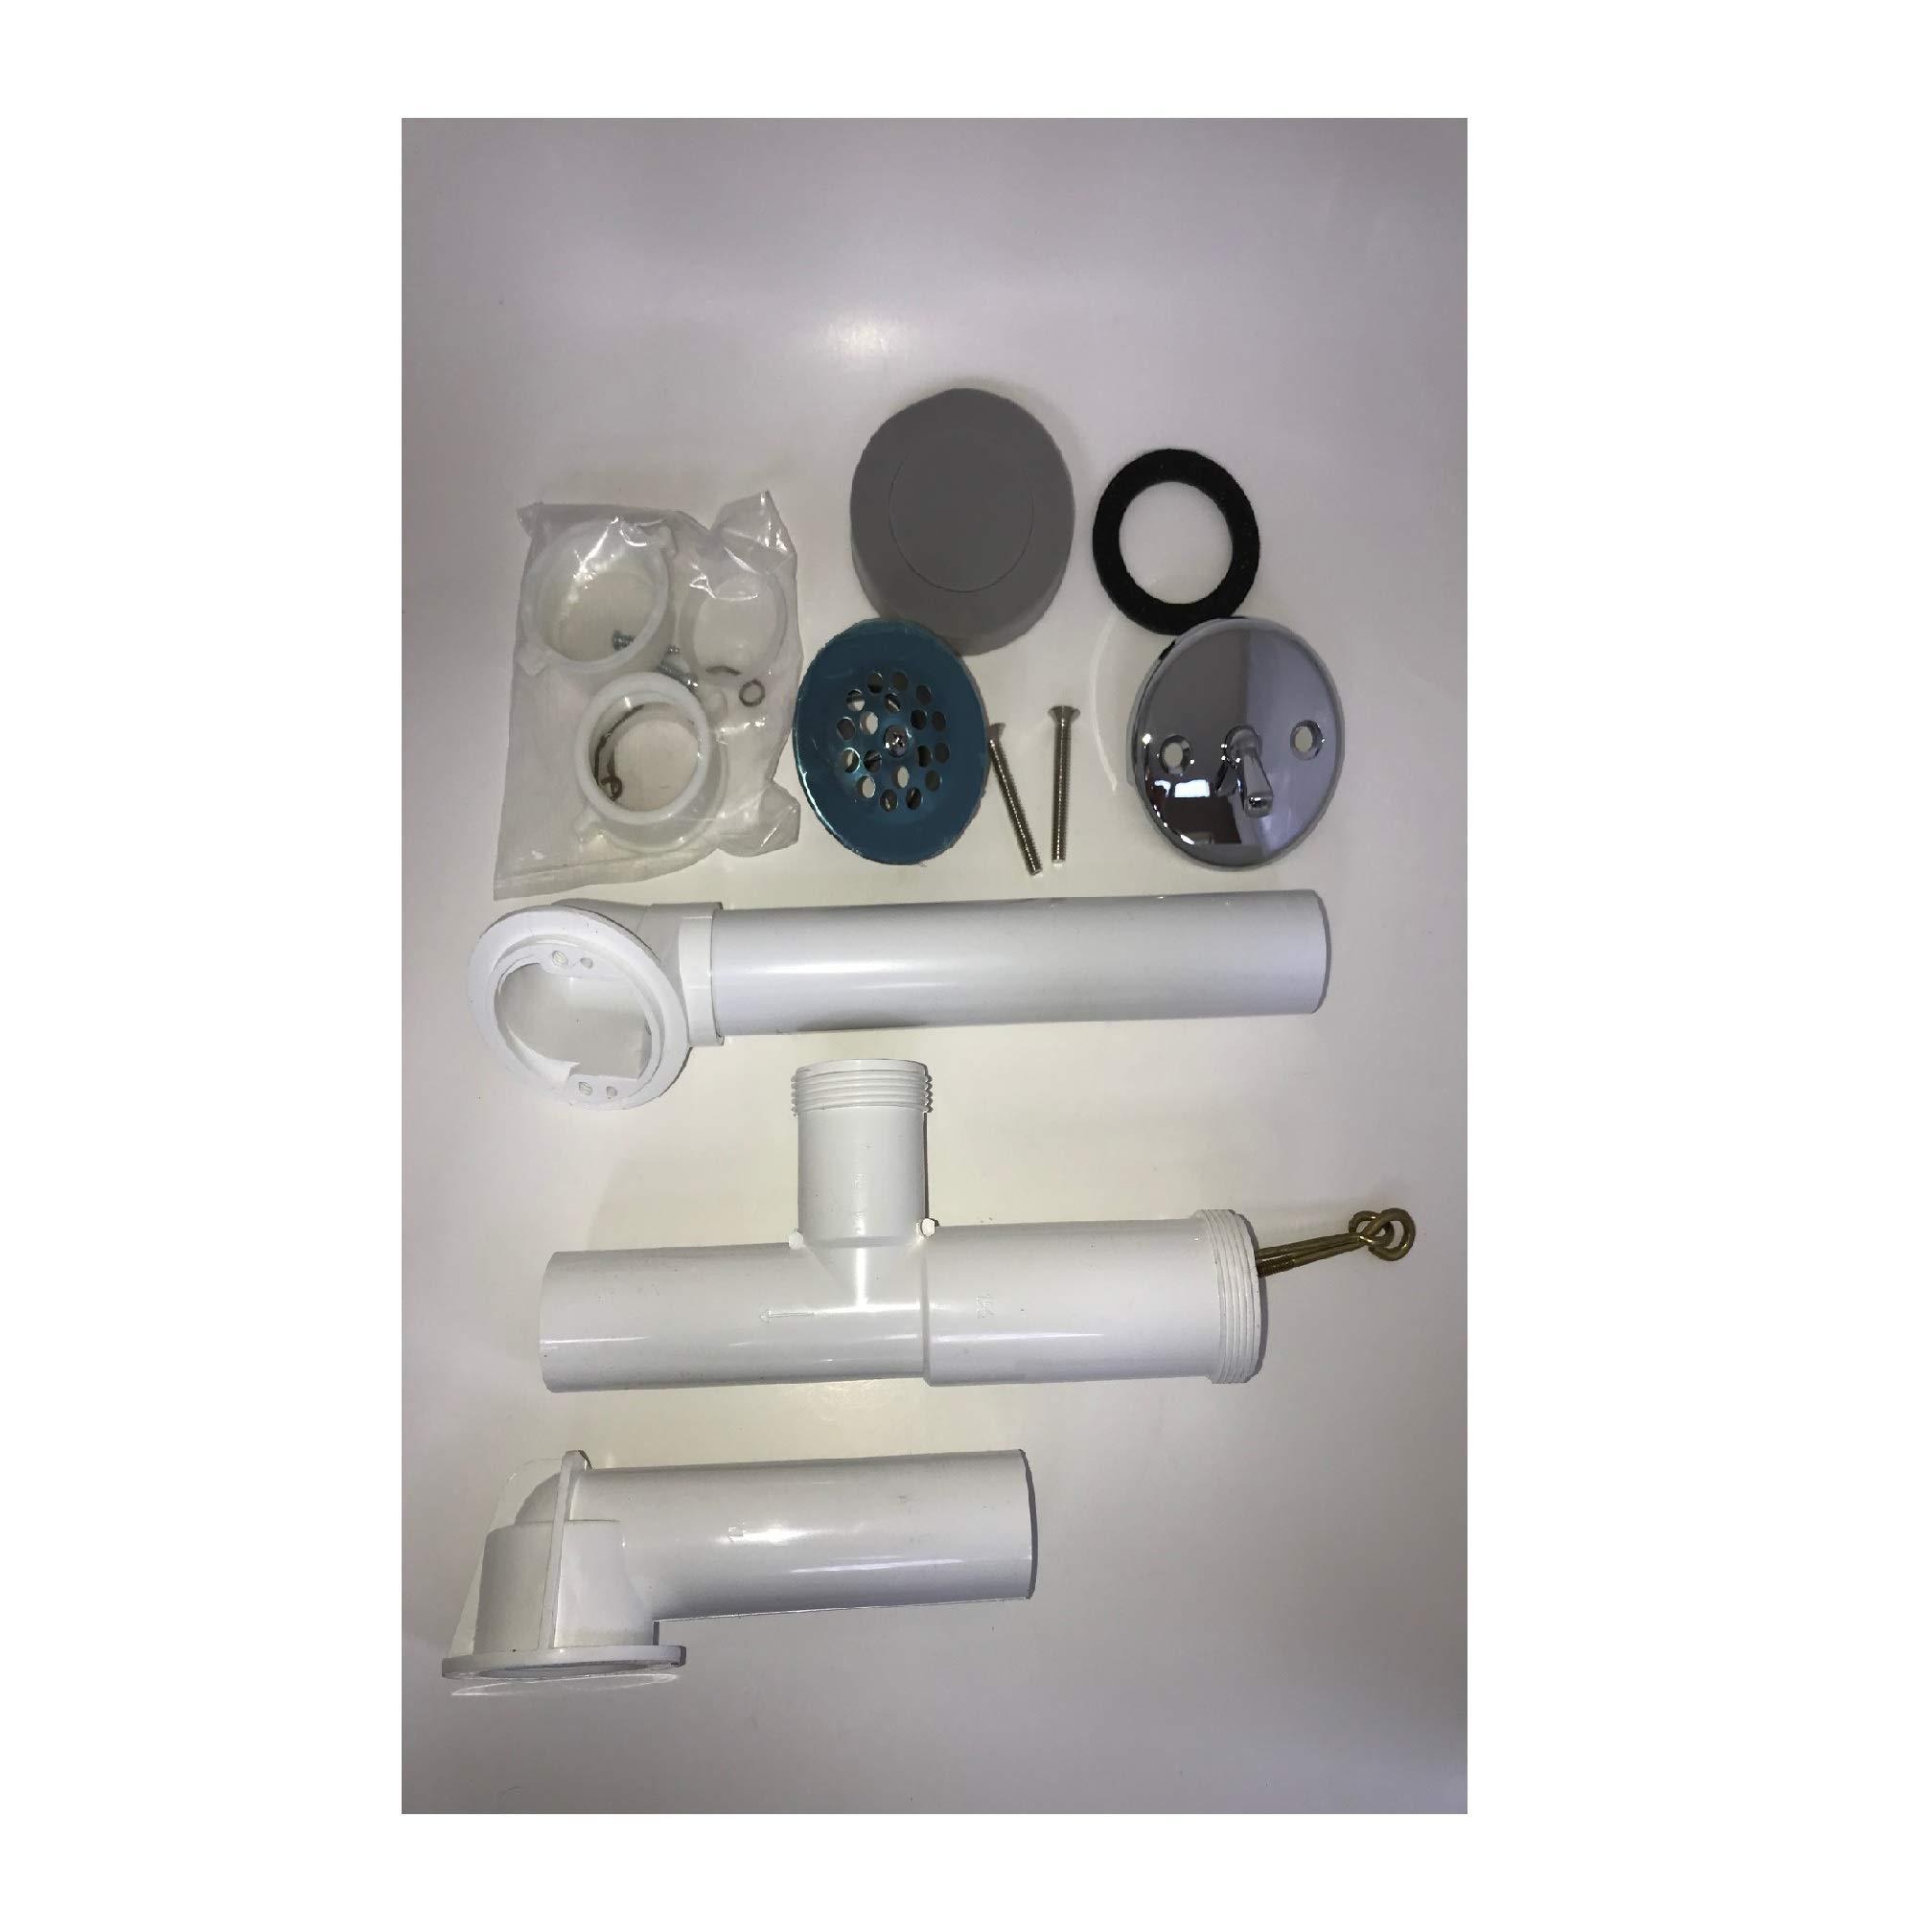 Bathtub Overflow Assembly Parts - 1210 PVC (Chrome Plated)